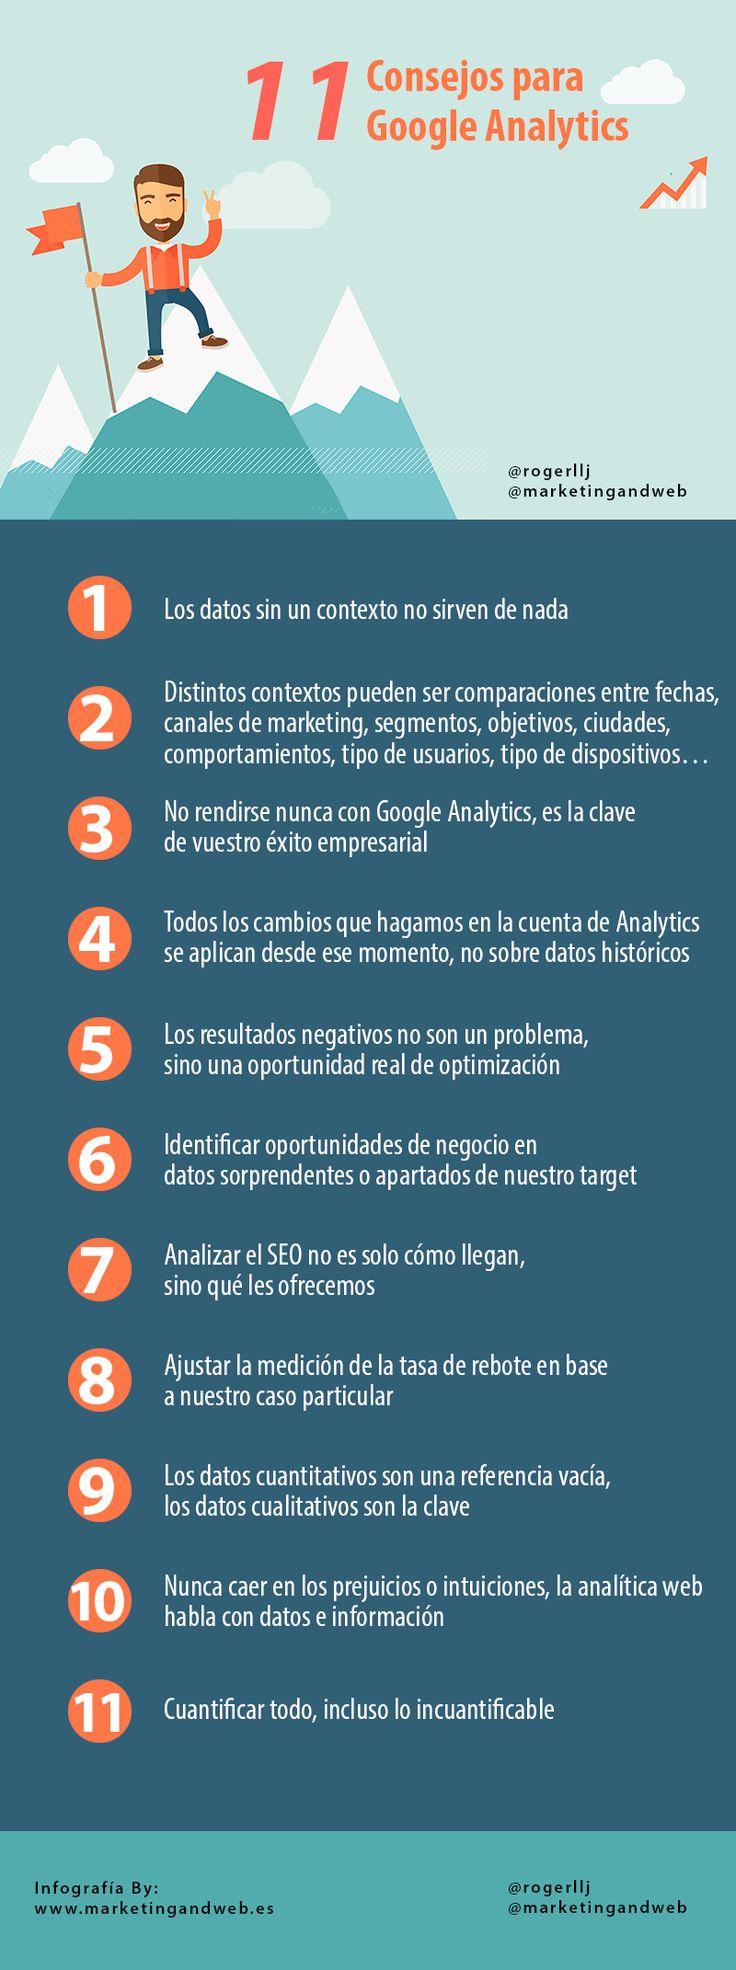 11 consejos para Google Analytics